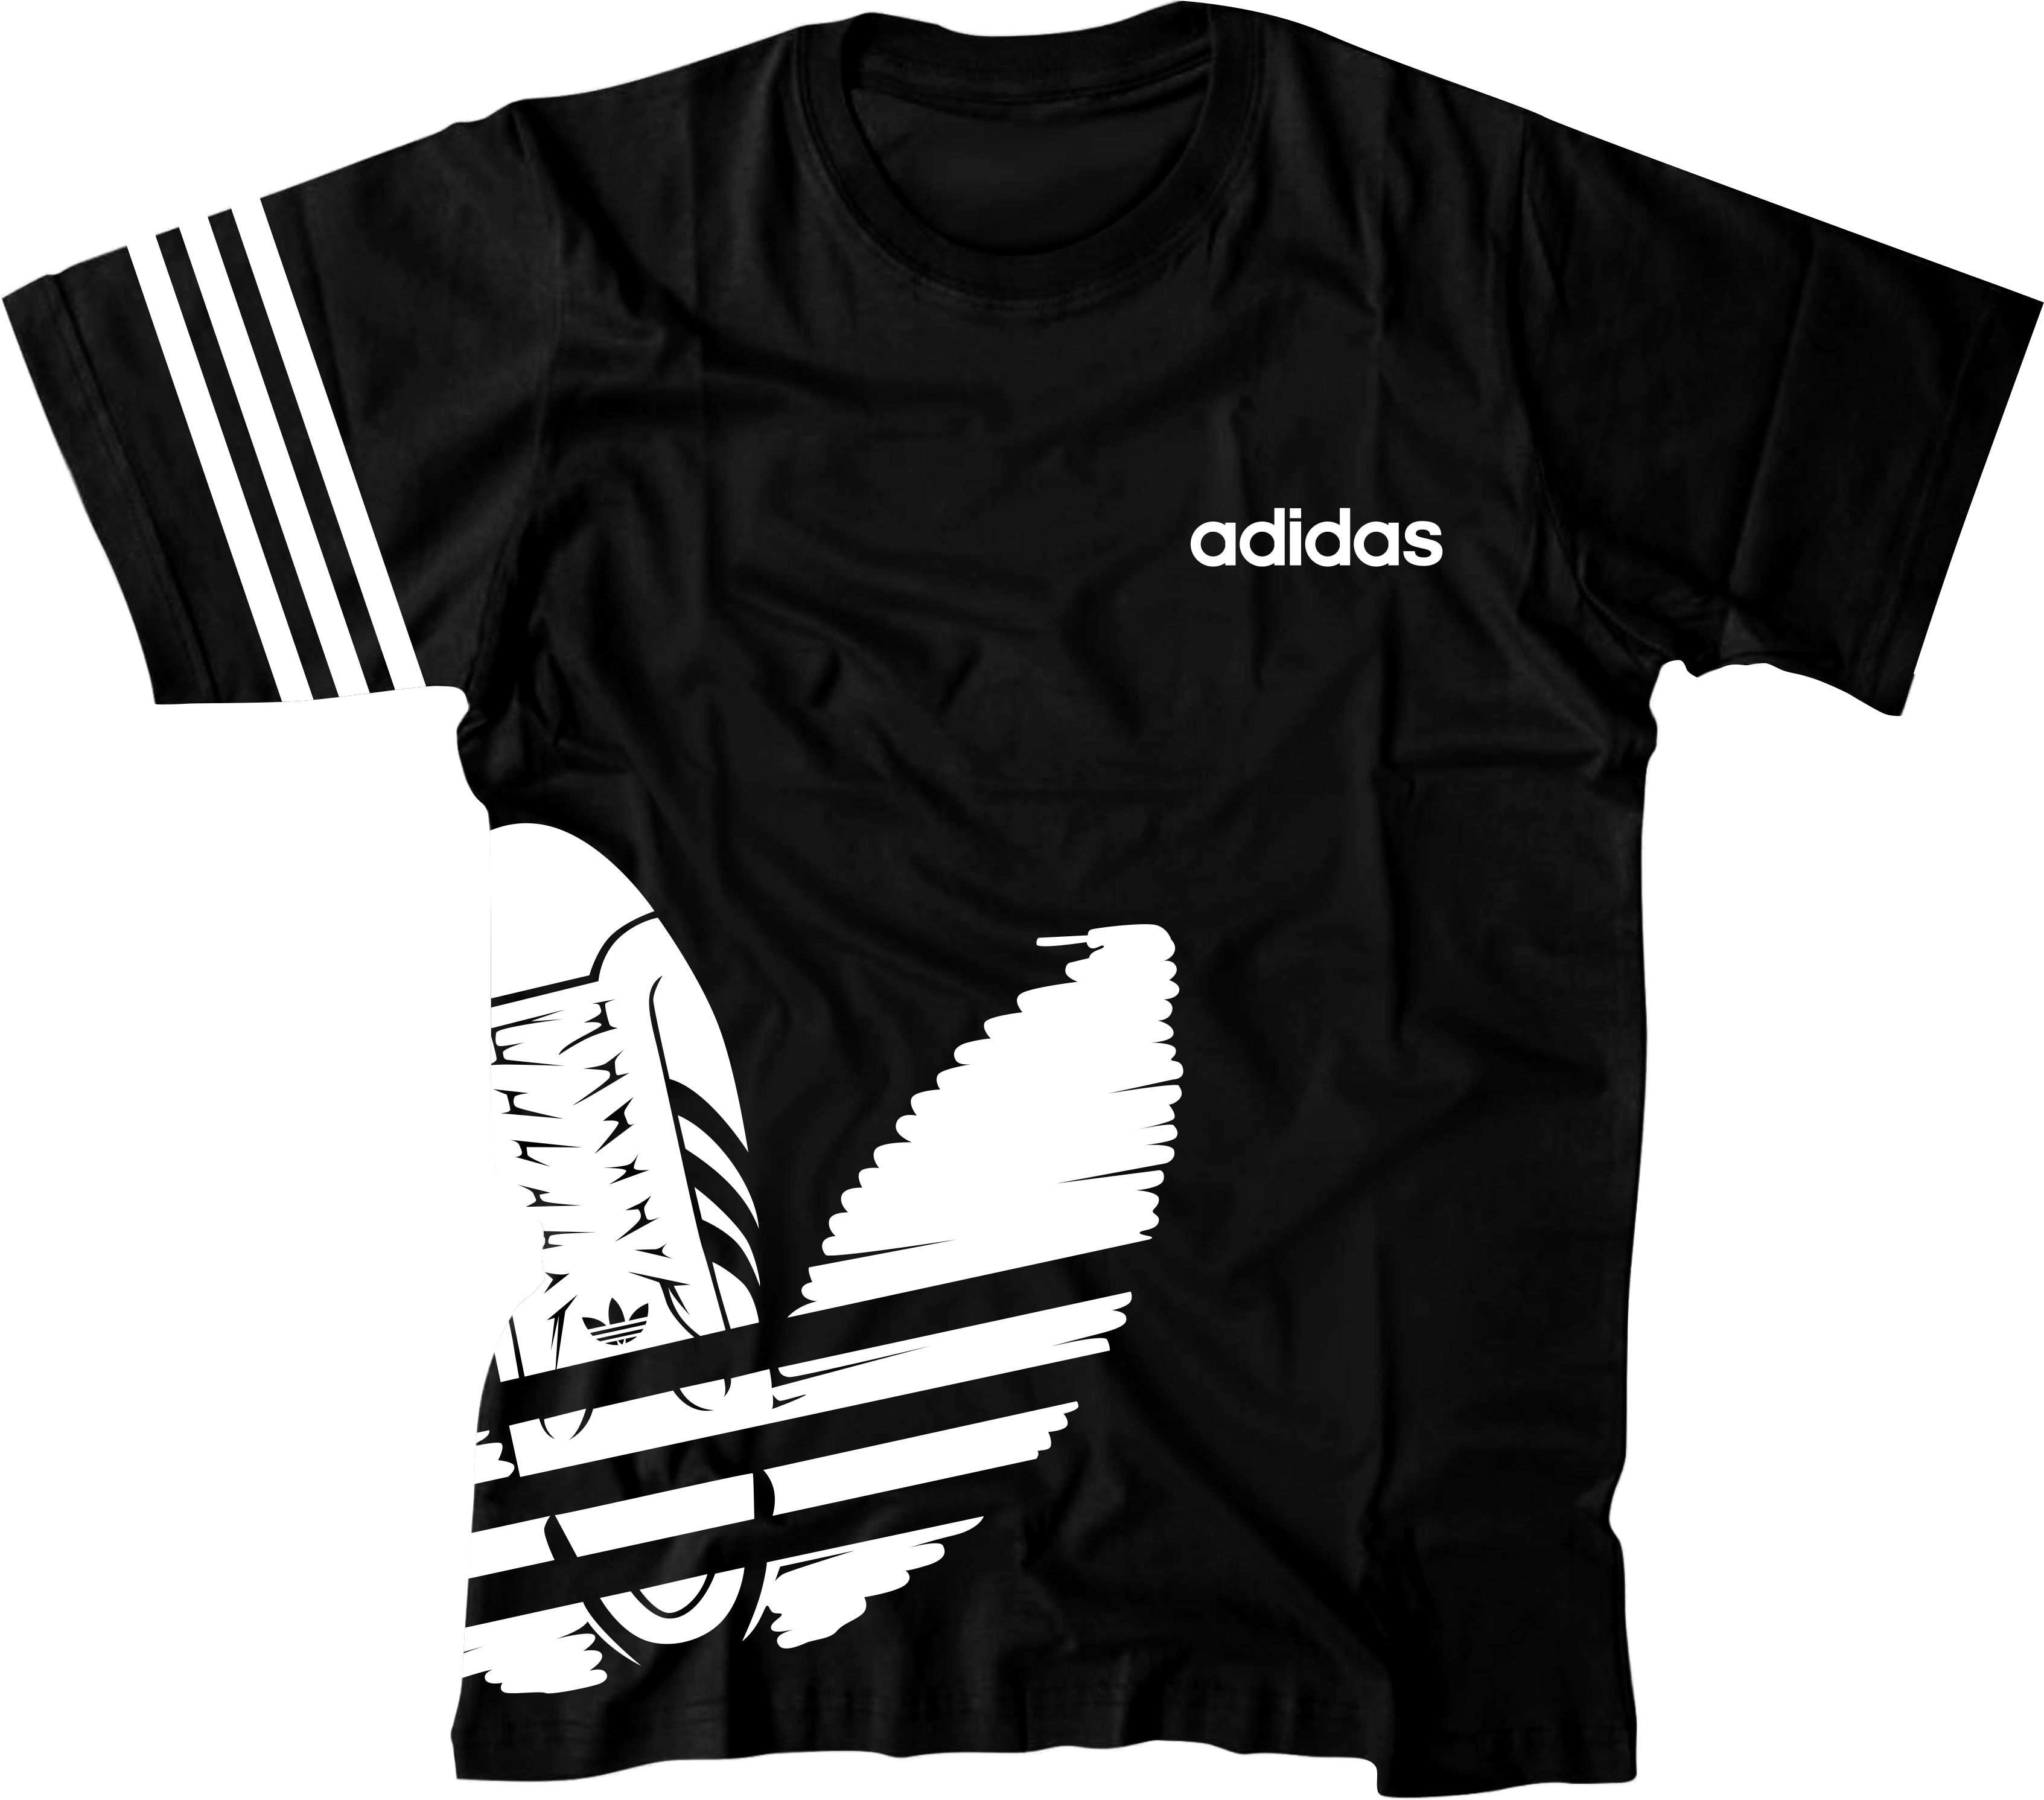 T ripcurl nike quiksilver adidas billabong volcom Shirt IFw7rqIO